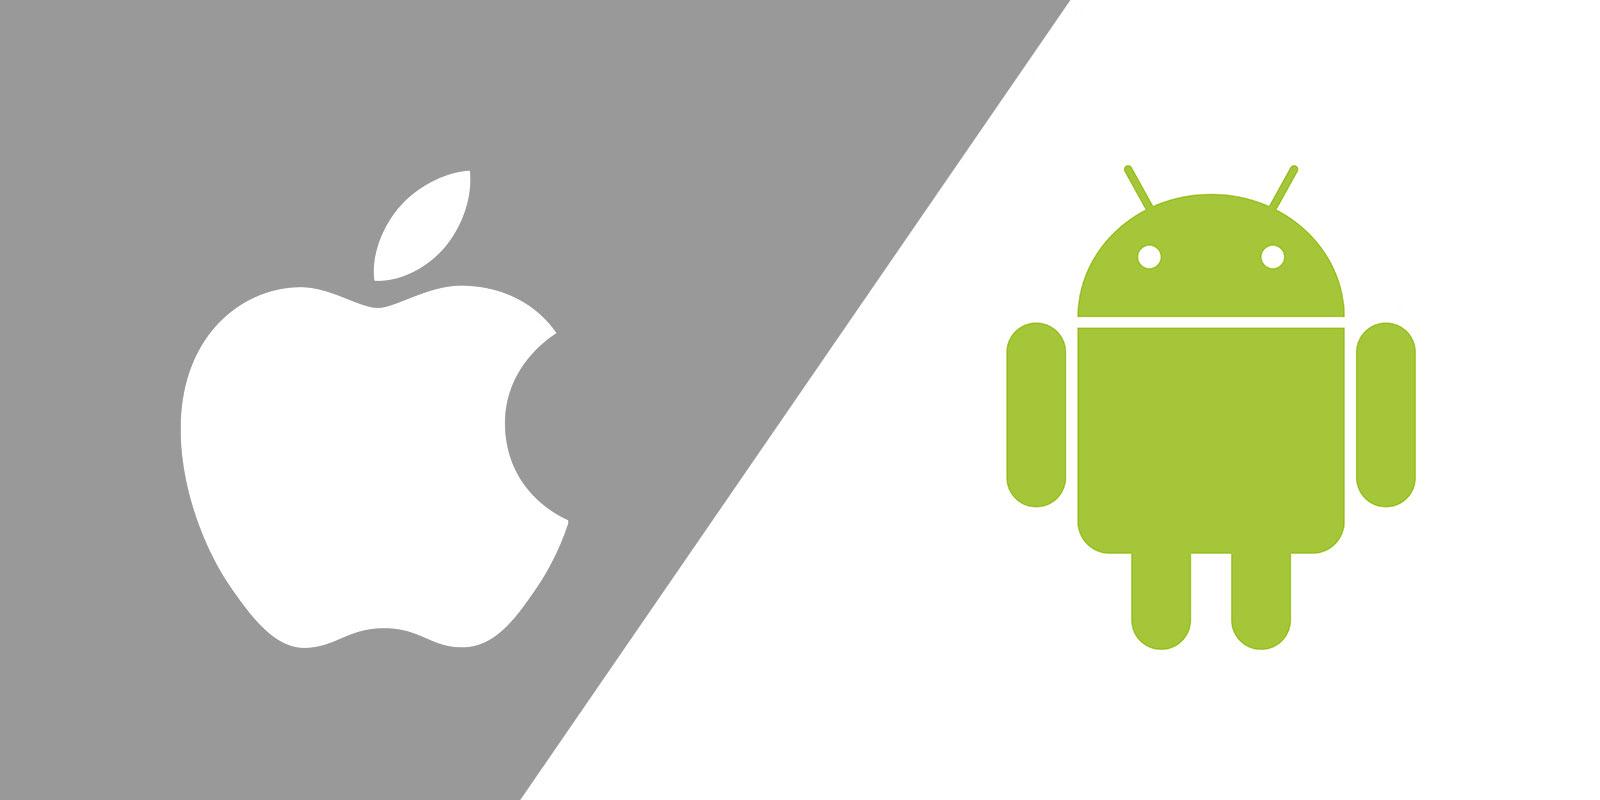 ios vs android users - شرح طريقة إلغاء الاشتراك في تطبيقات أندرويد وآيفون بسهولة